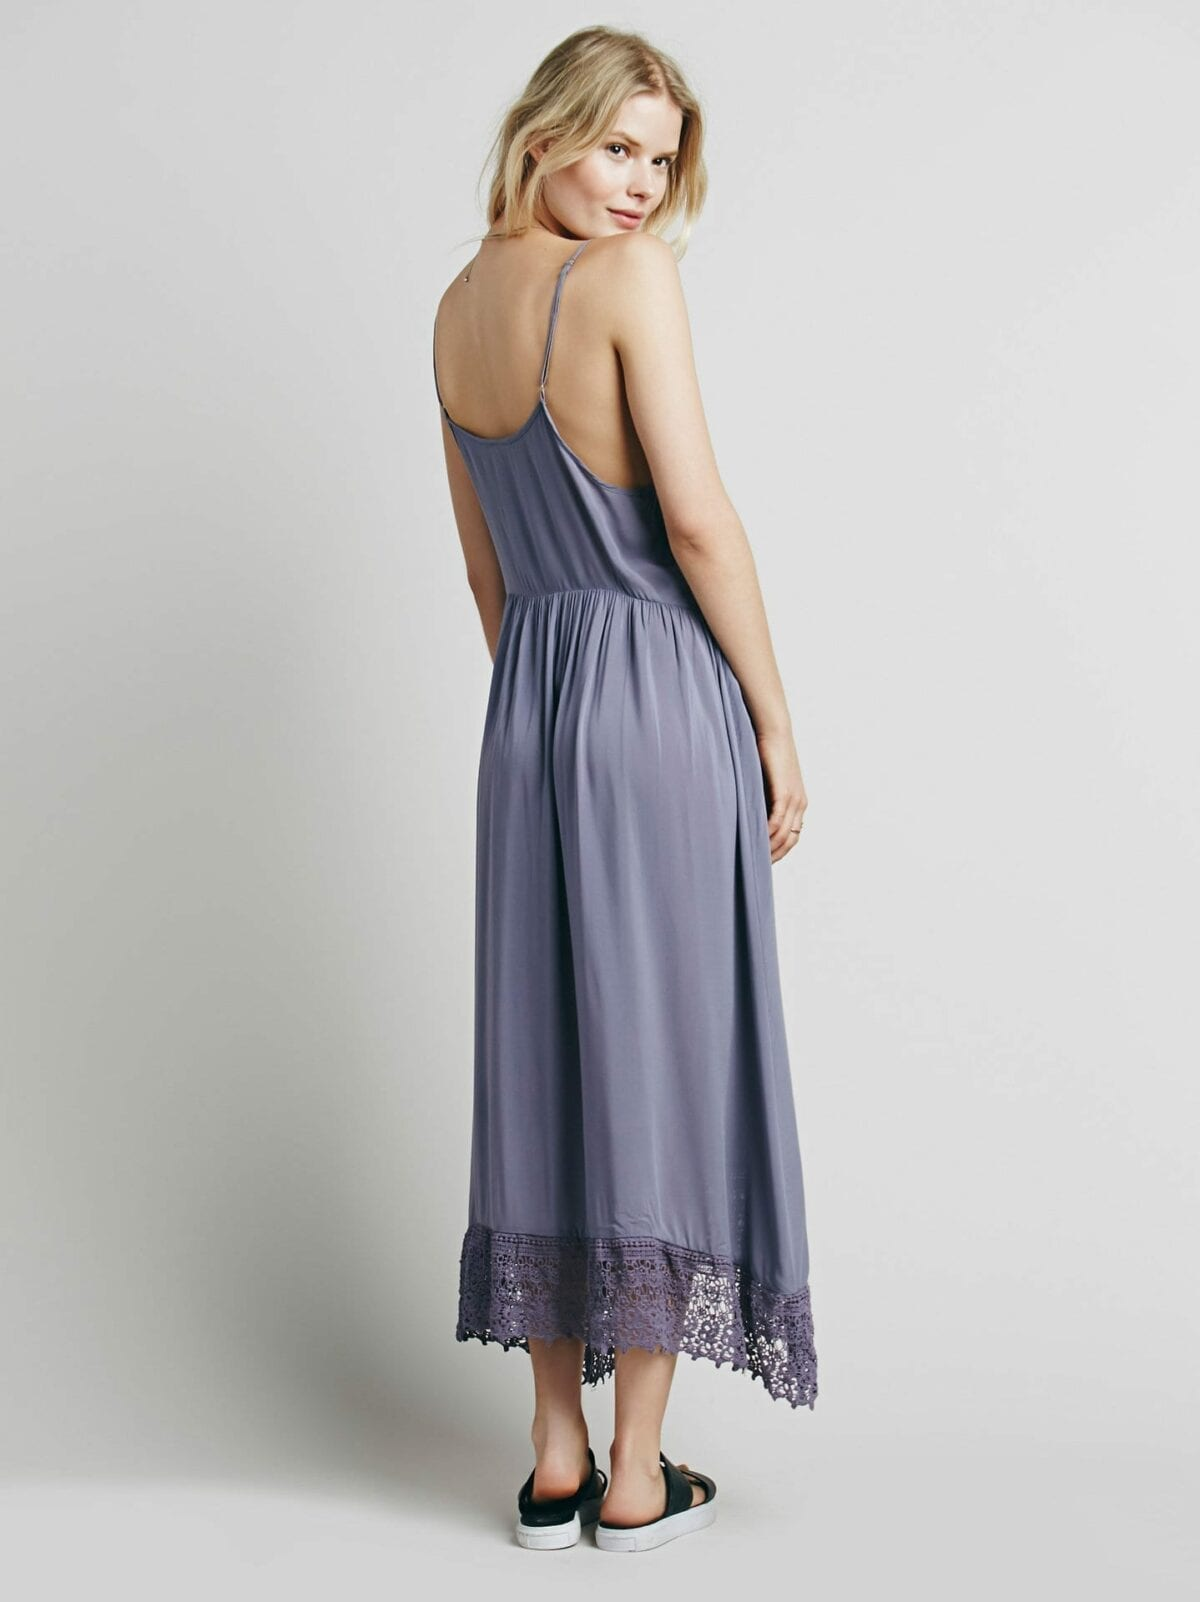 Boho Beach Lace Crochet Slip Dress